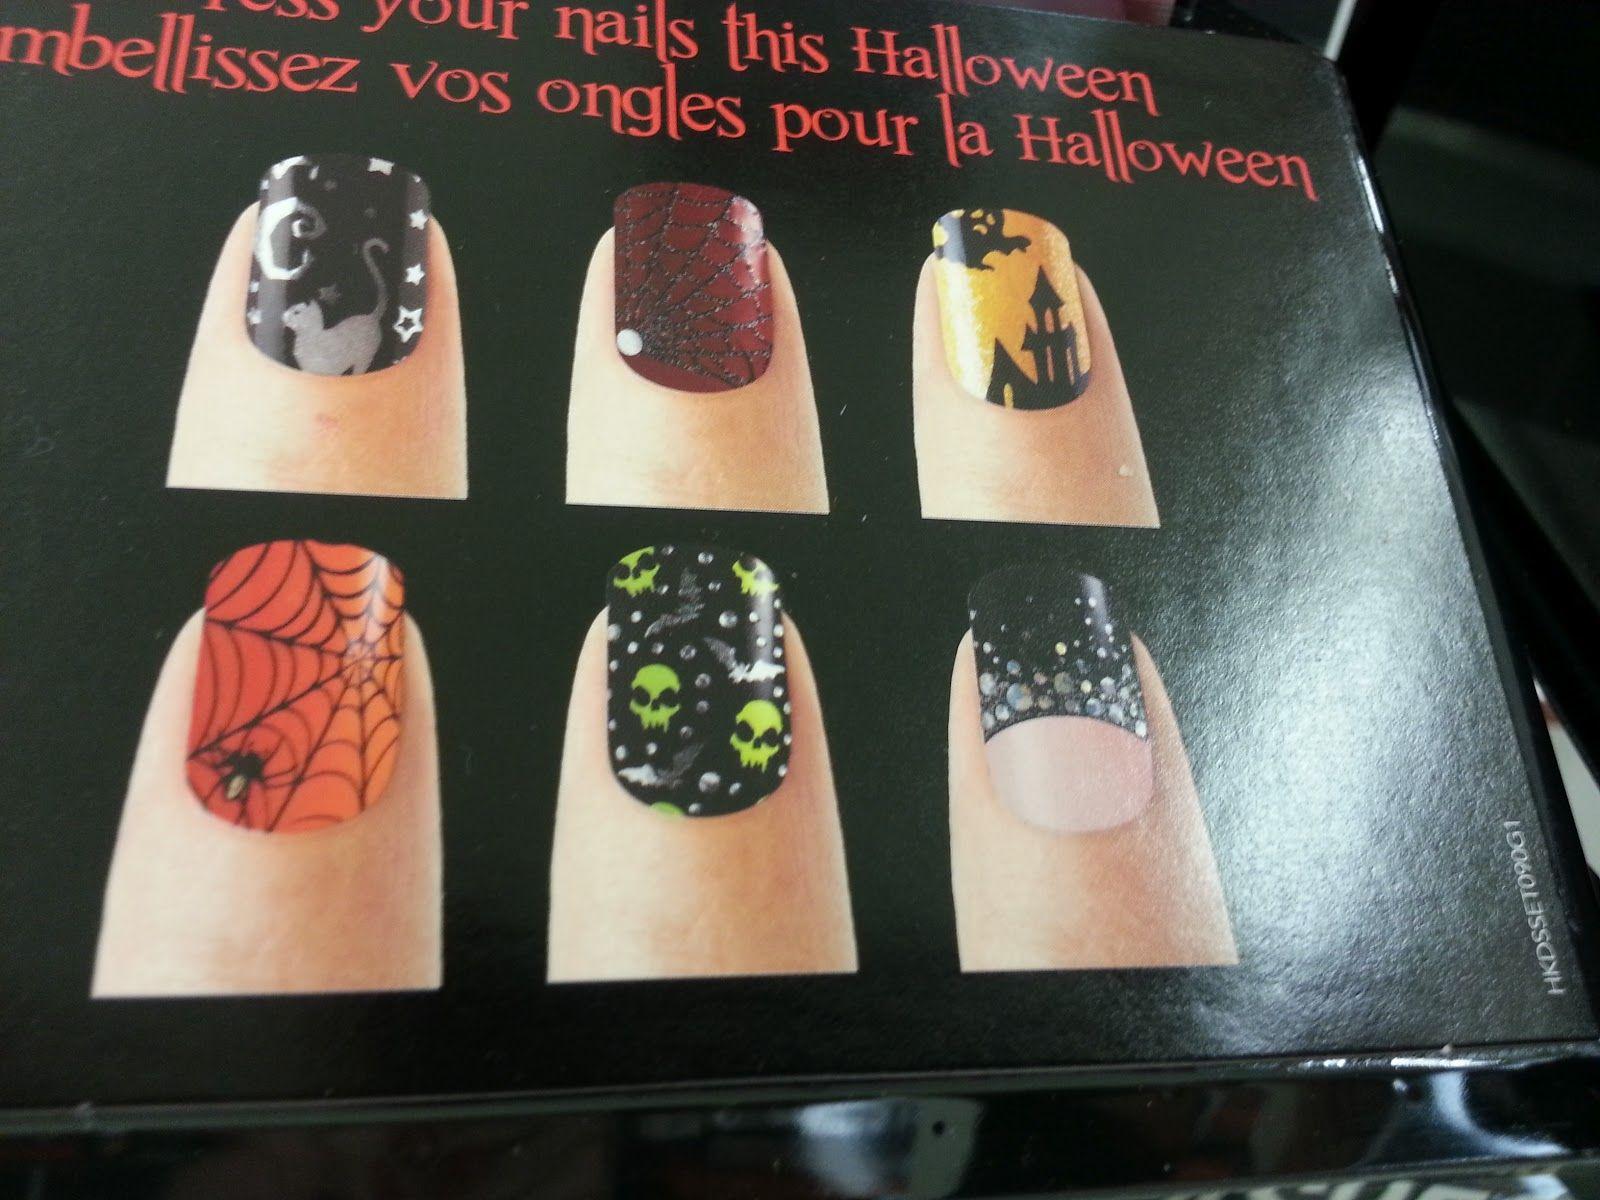 New Halloween Nail Polish Strips from Kiss | Mani Pedi | Pinterest ...